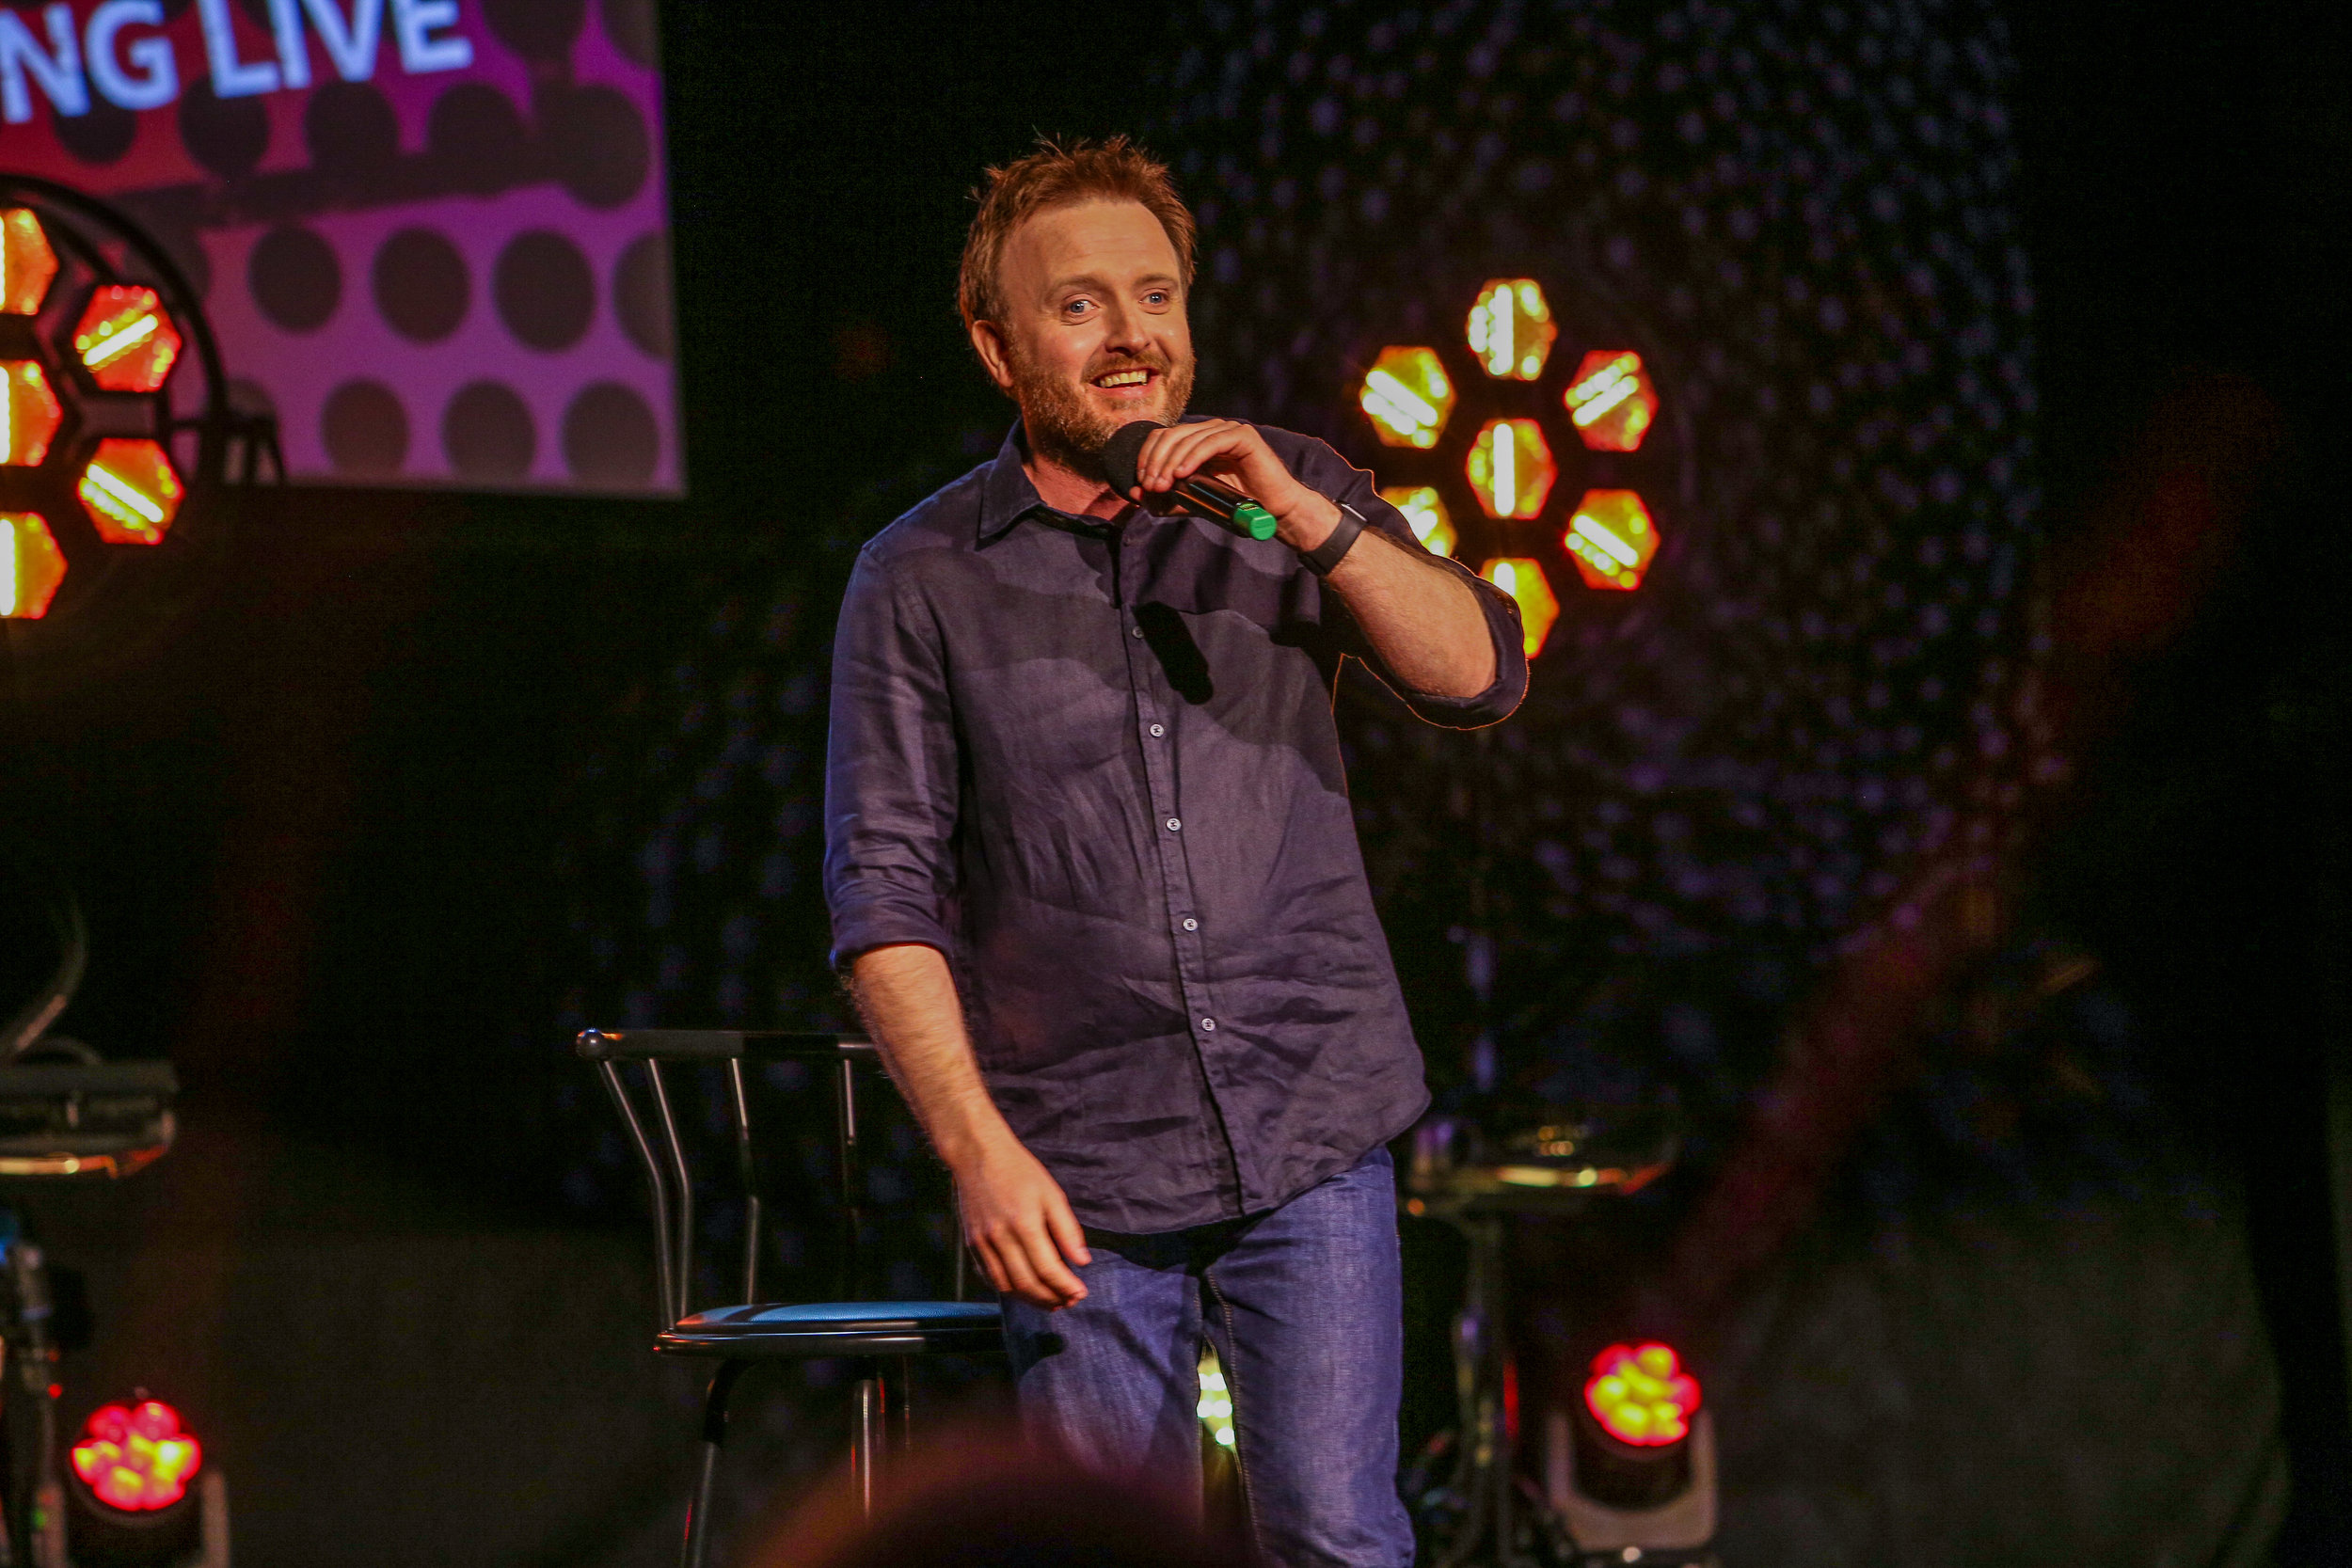 Storytelling Live 2019 - 04 - Chris McCausland.jpg